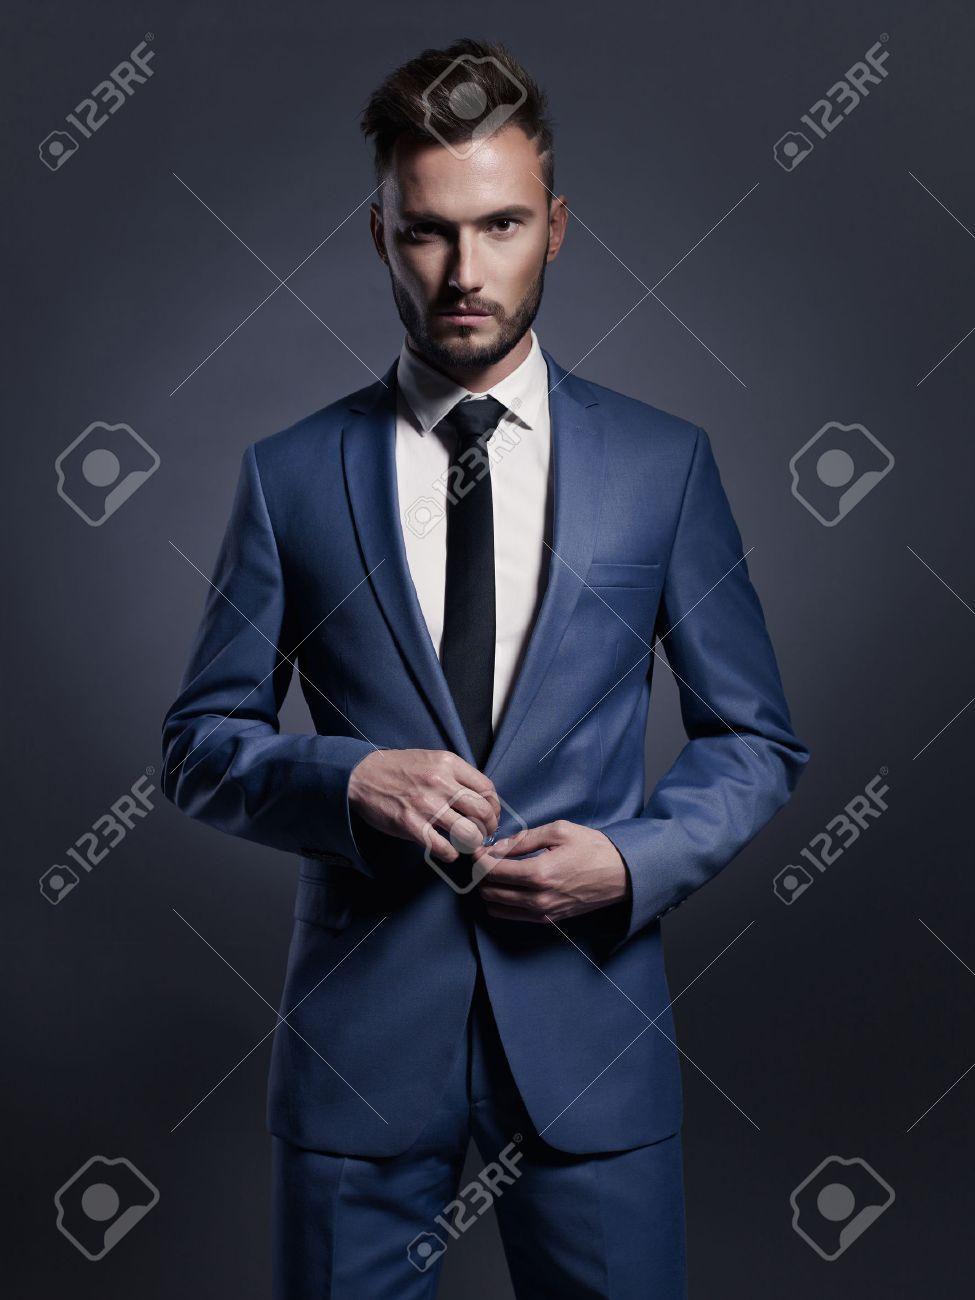 Portrait of handsome stylish man in elegant blue suit Standard-Bild - 46882282